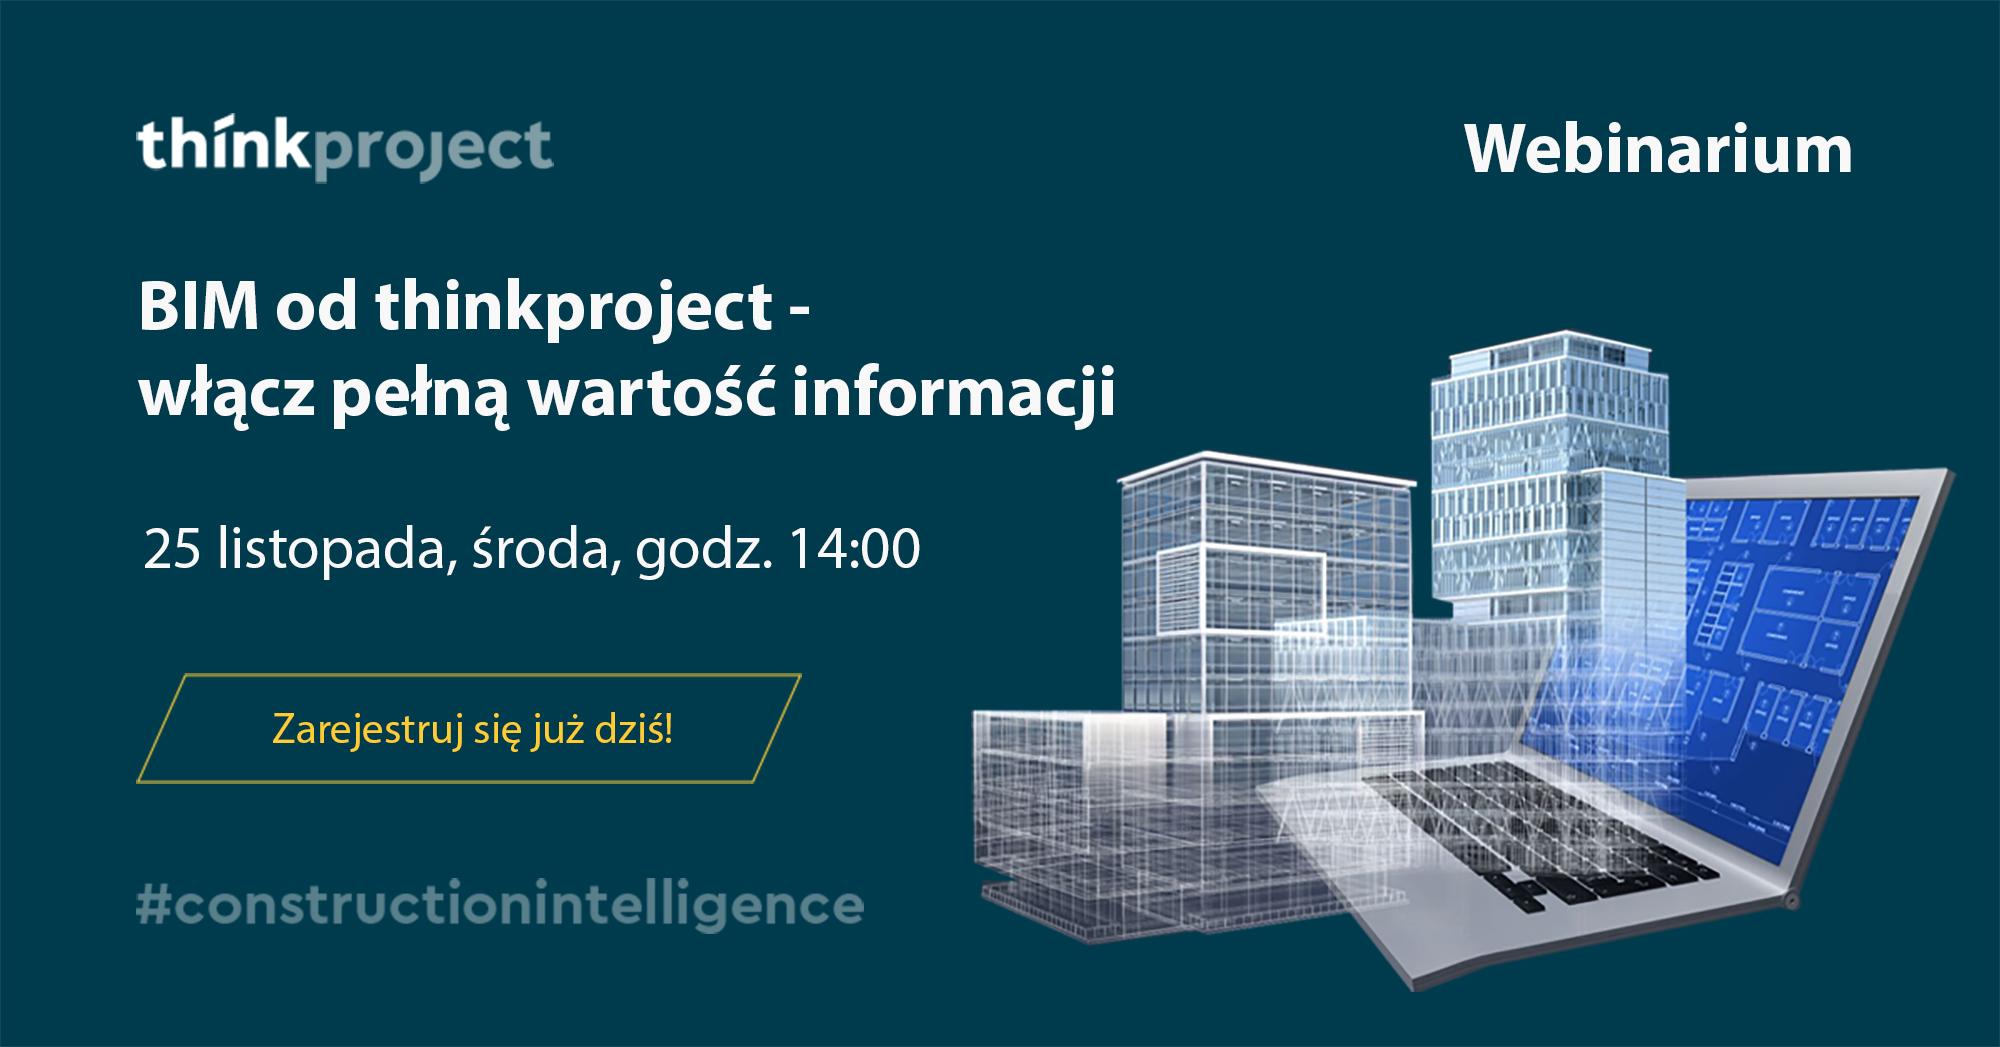 WEBINARIUM thinkproject